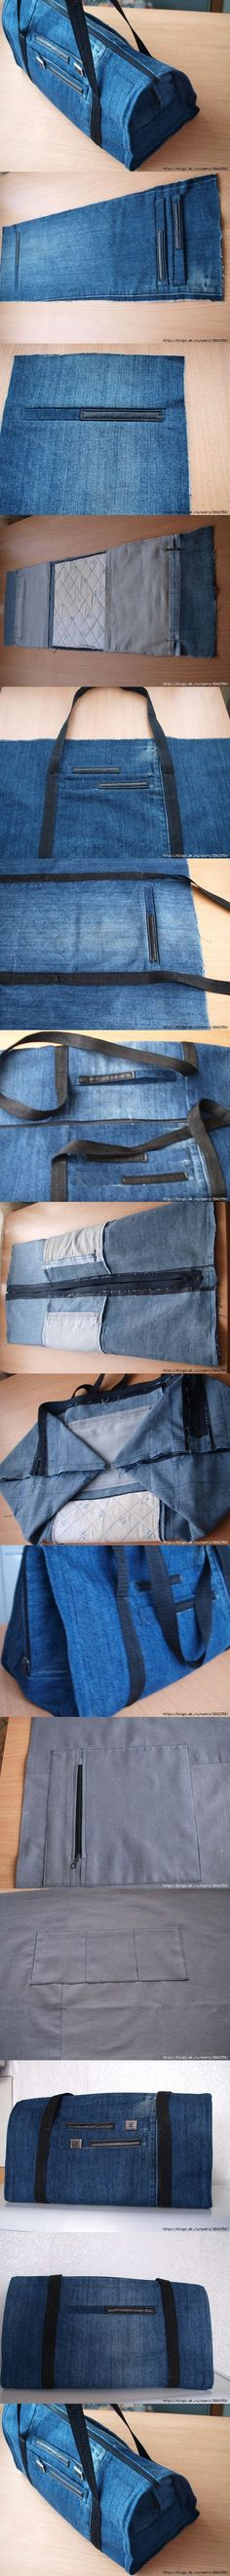 DIY Cool Handbag from Old Jeans | www.FabArtDIY.com LIKE Us on Facebook ==> https://www.facebook.com/FabArtDIY: